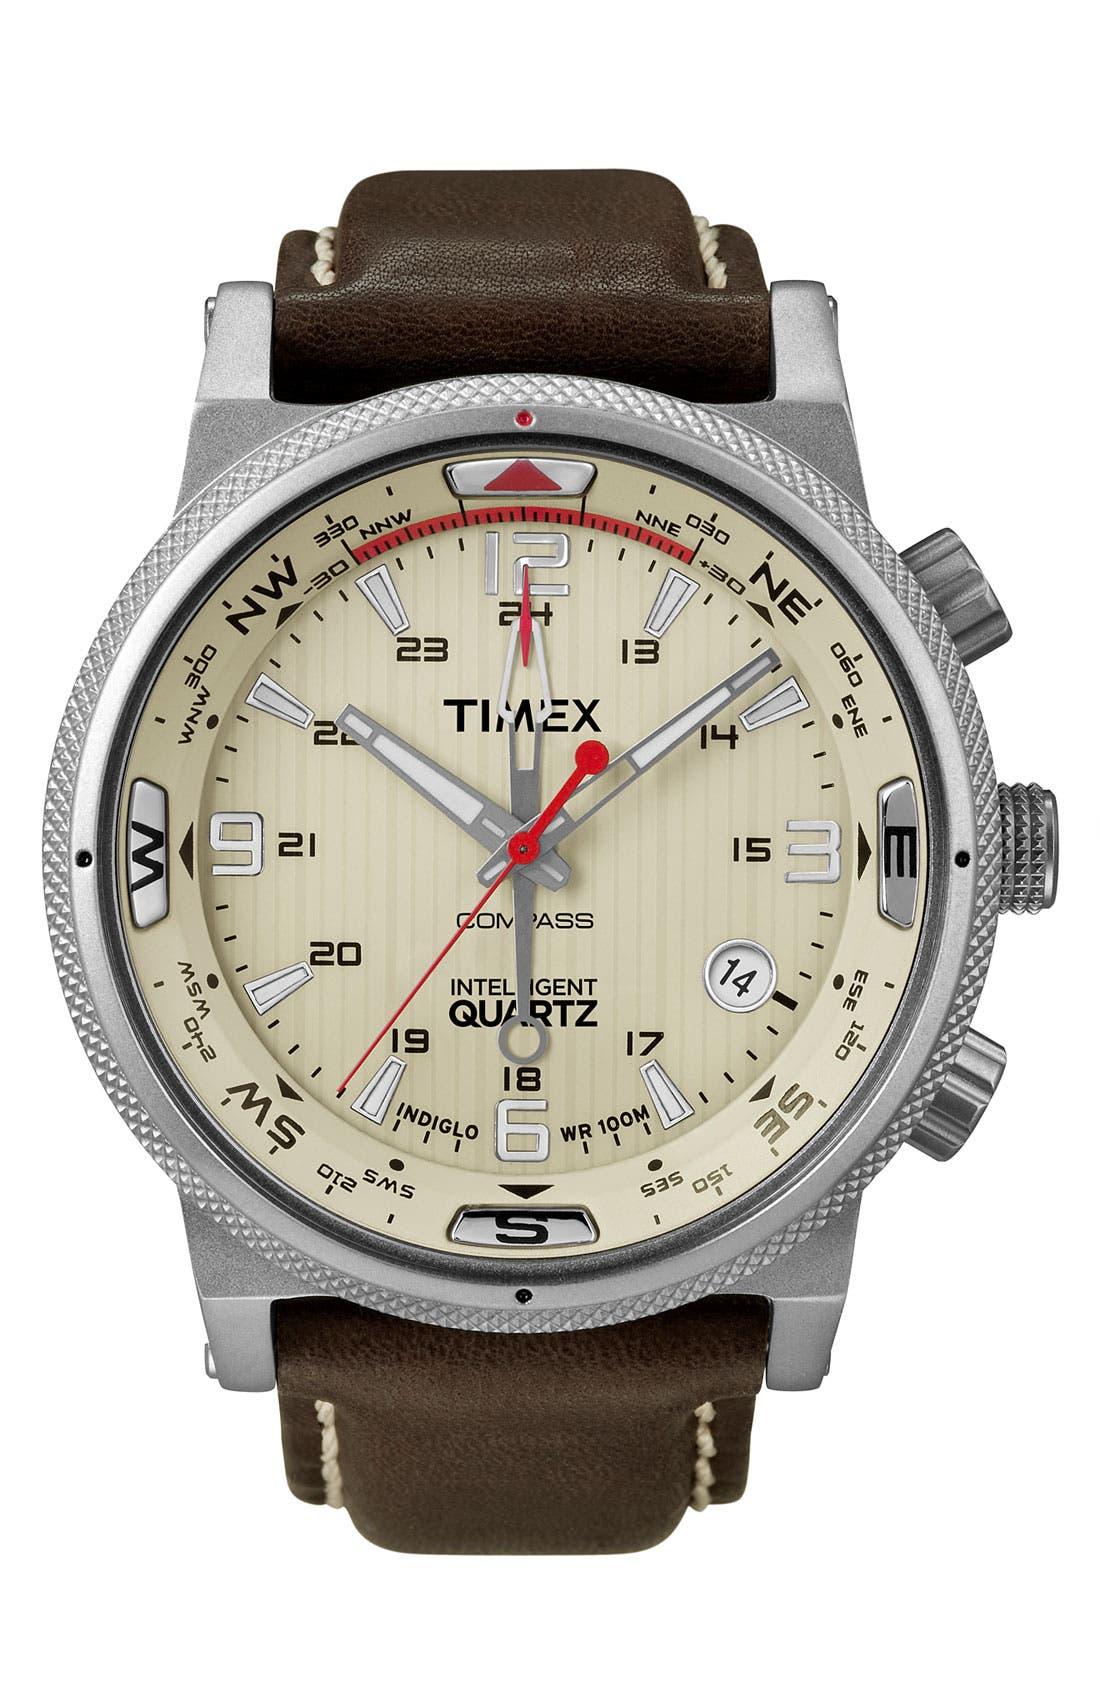 Main Image - Timex® 'Intelligent Quartz' Leather Strap Compass Watch